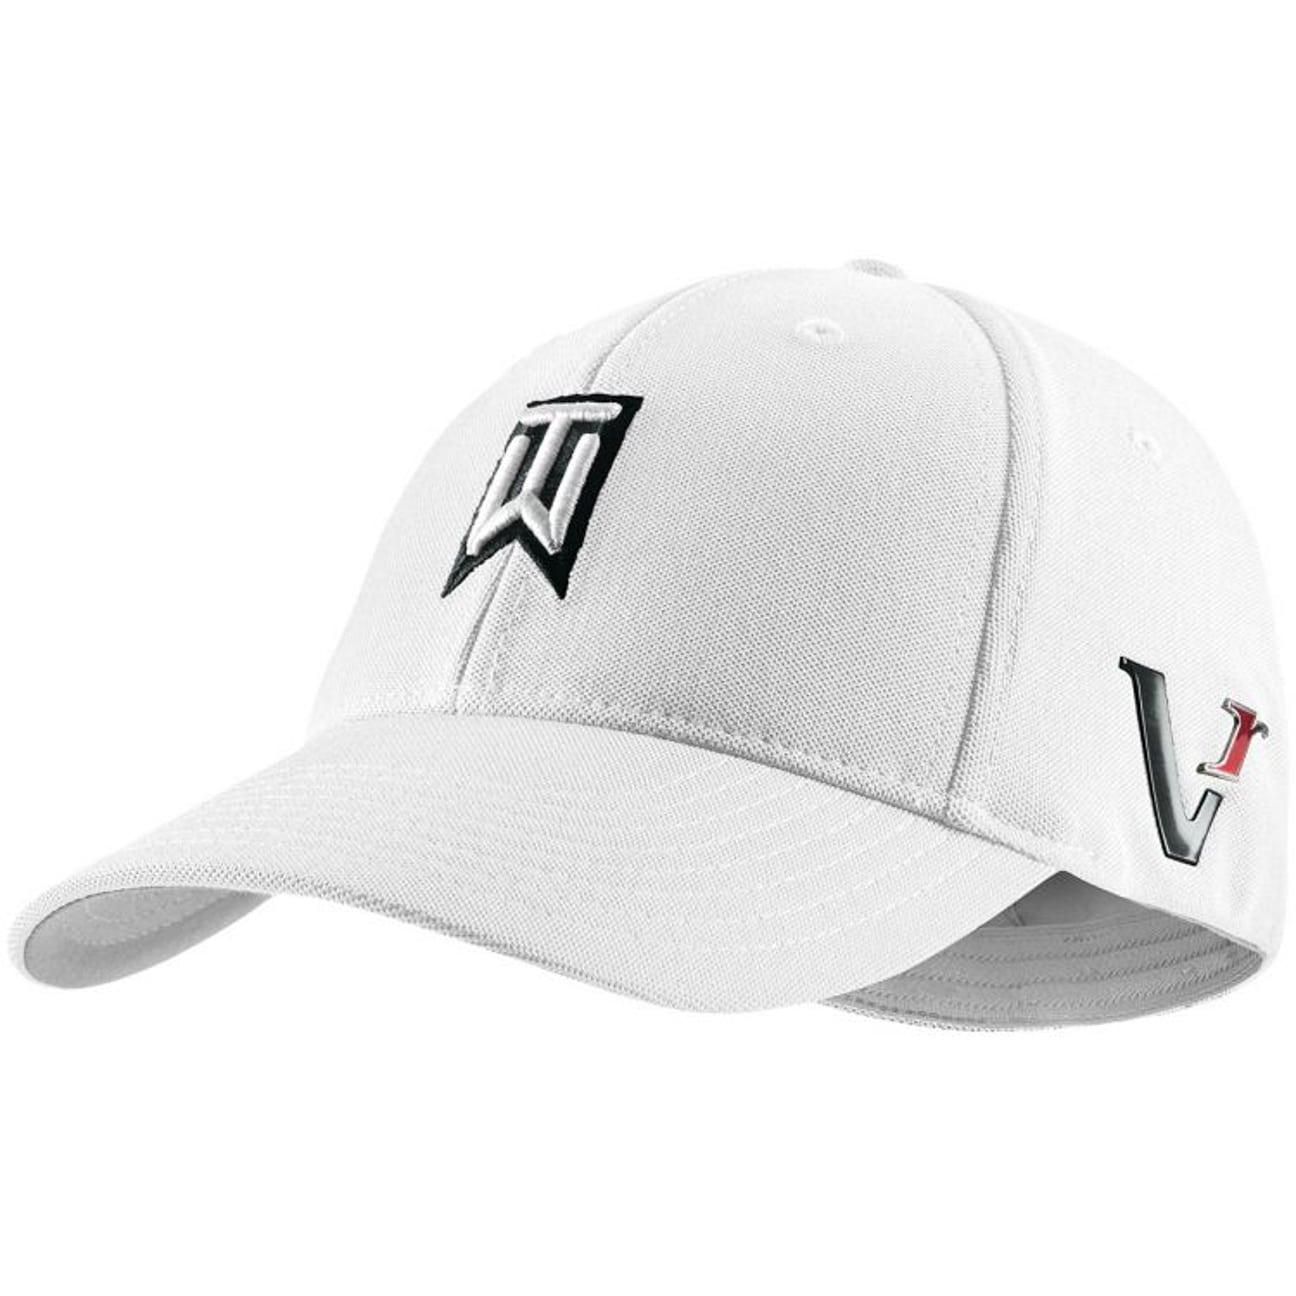 Tiger Woods Nike Hat - Hat HD Image Ukjugs.Org 5b742d437f4